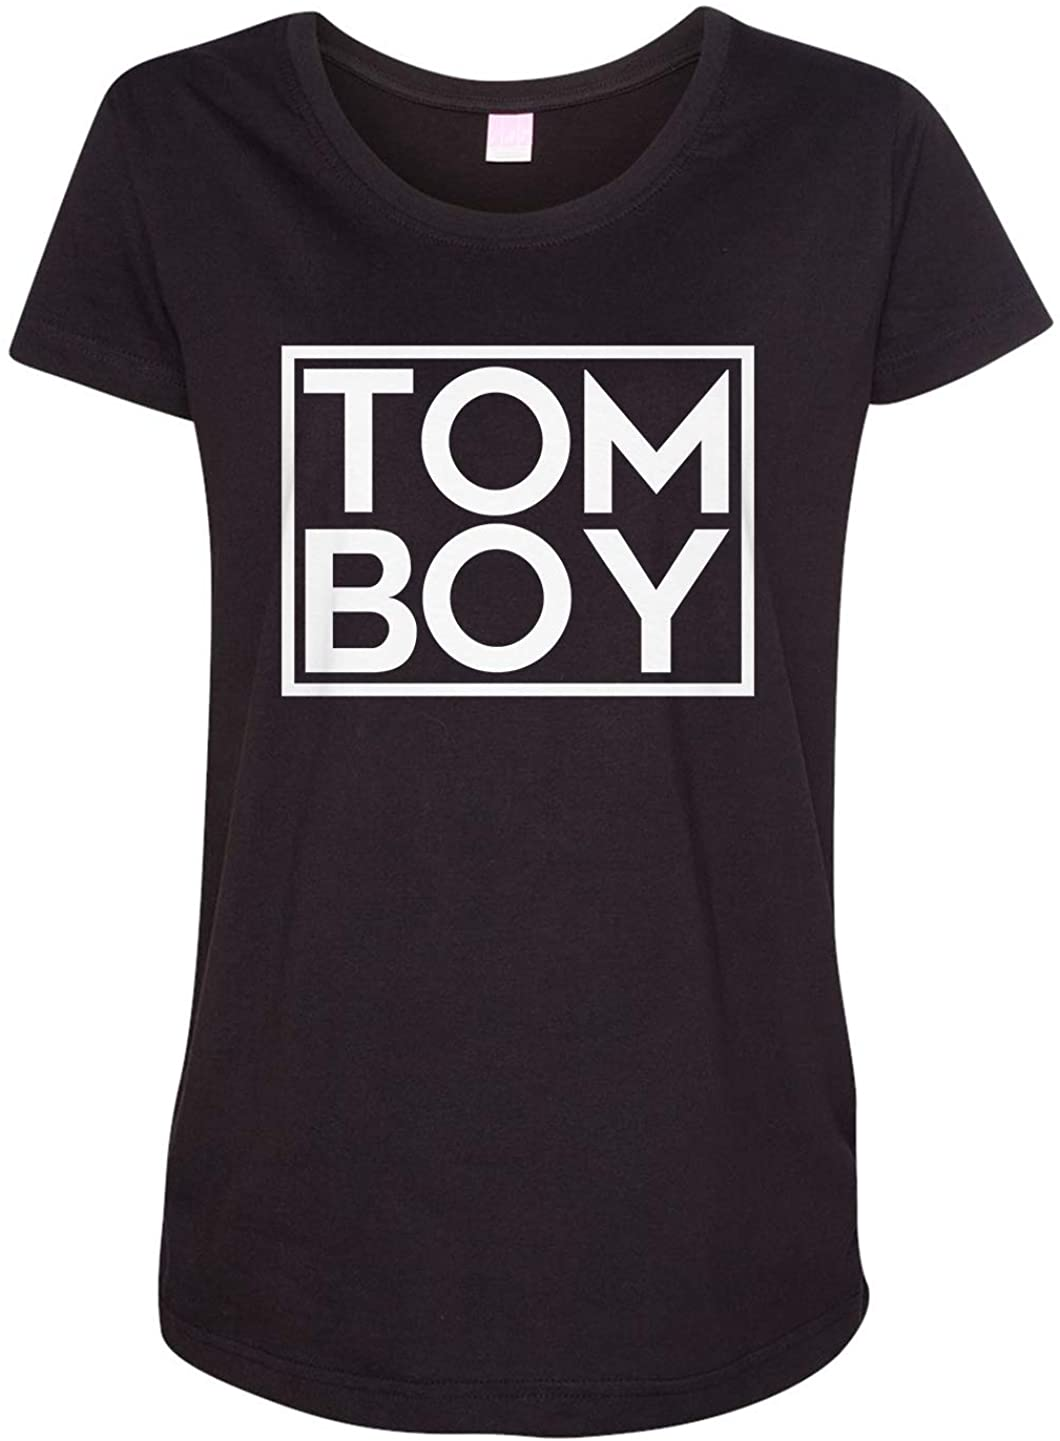 Tenacitee Ladies Tom Boy Maternity Shirt